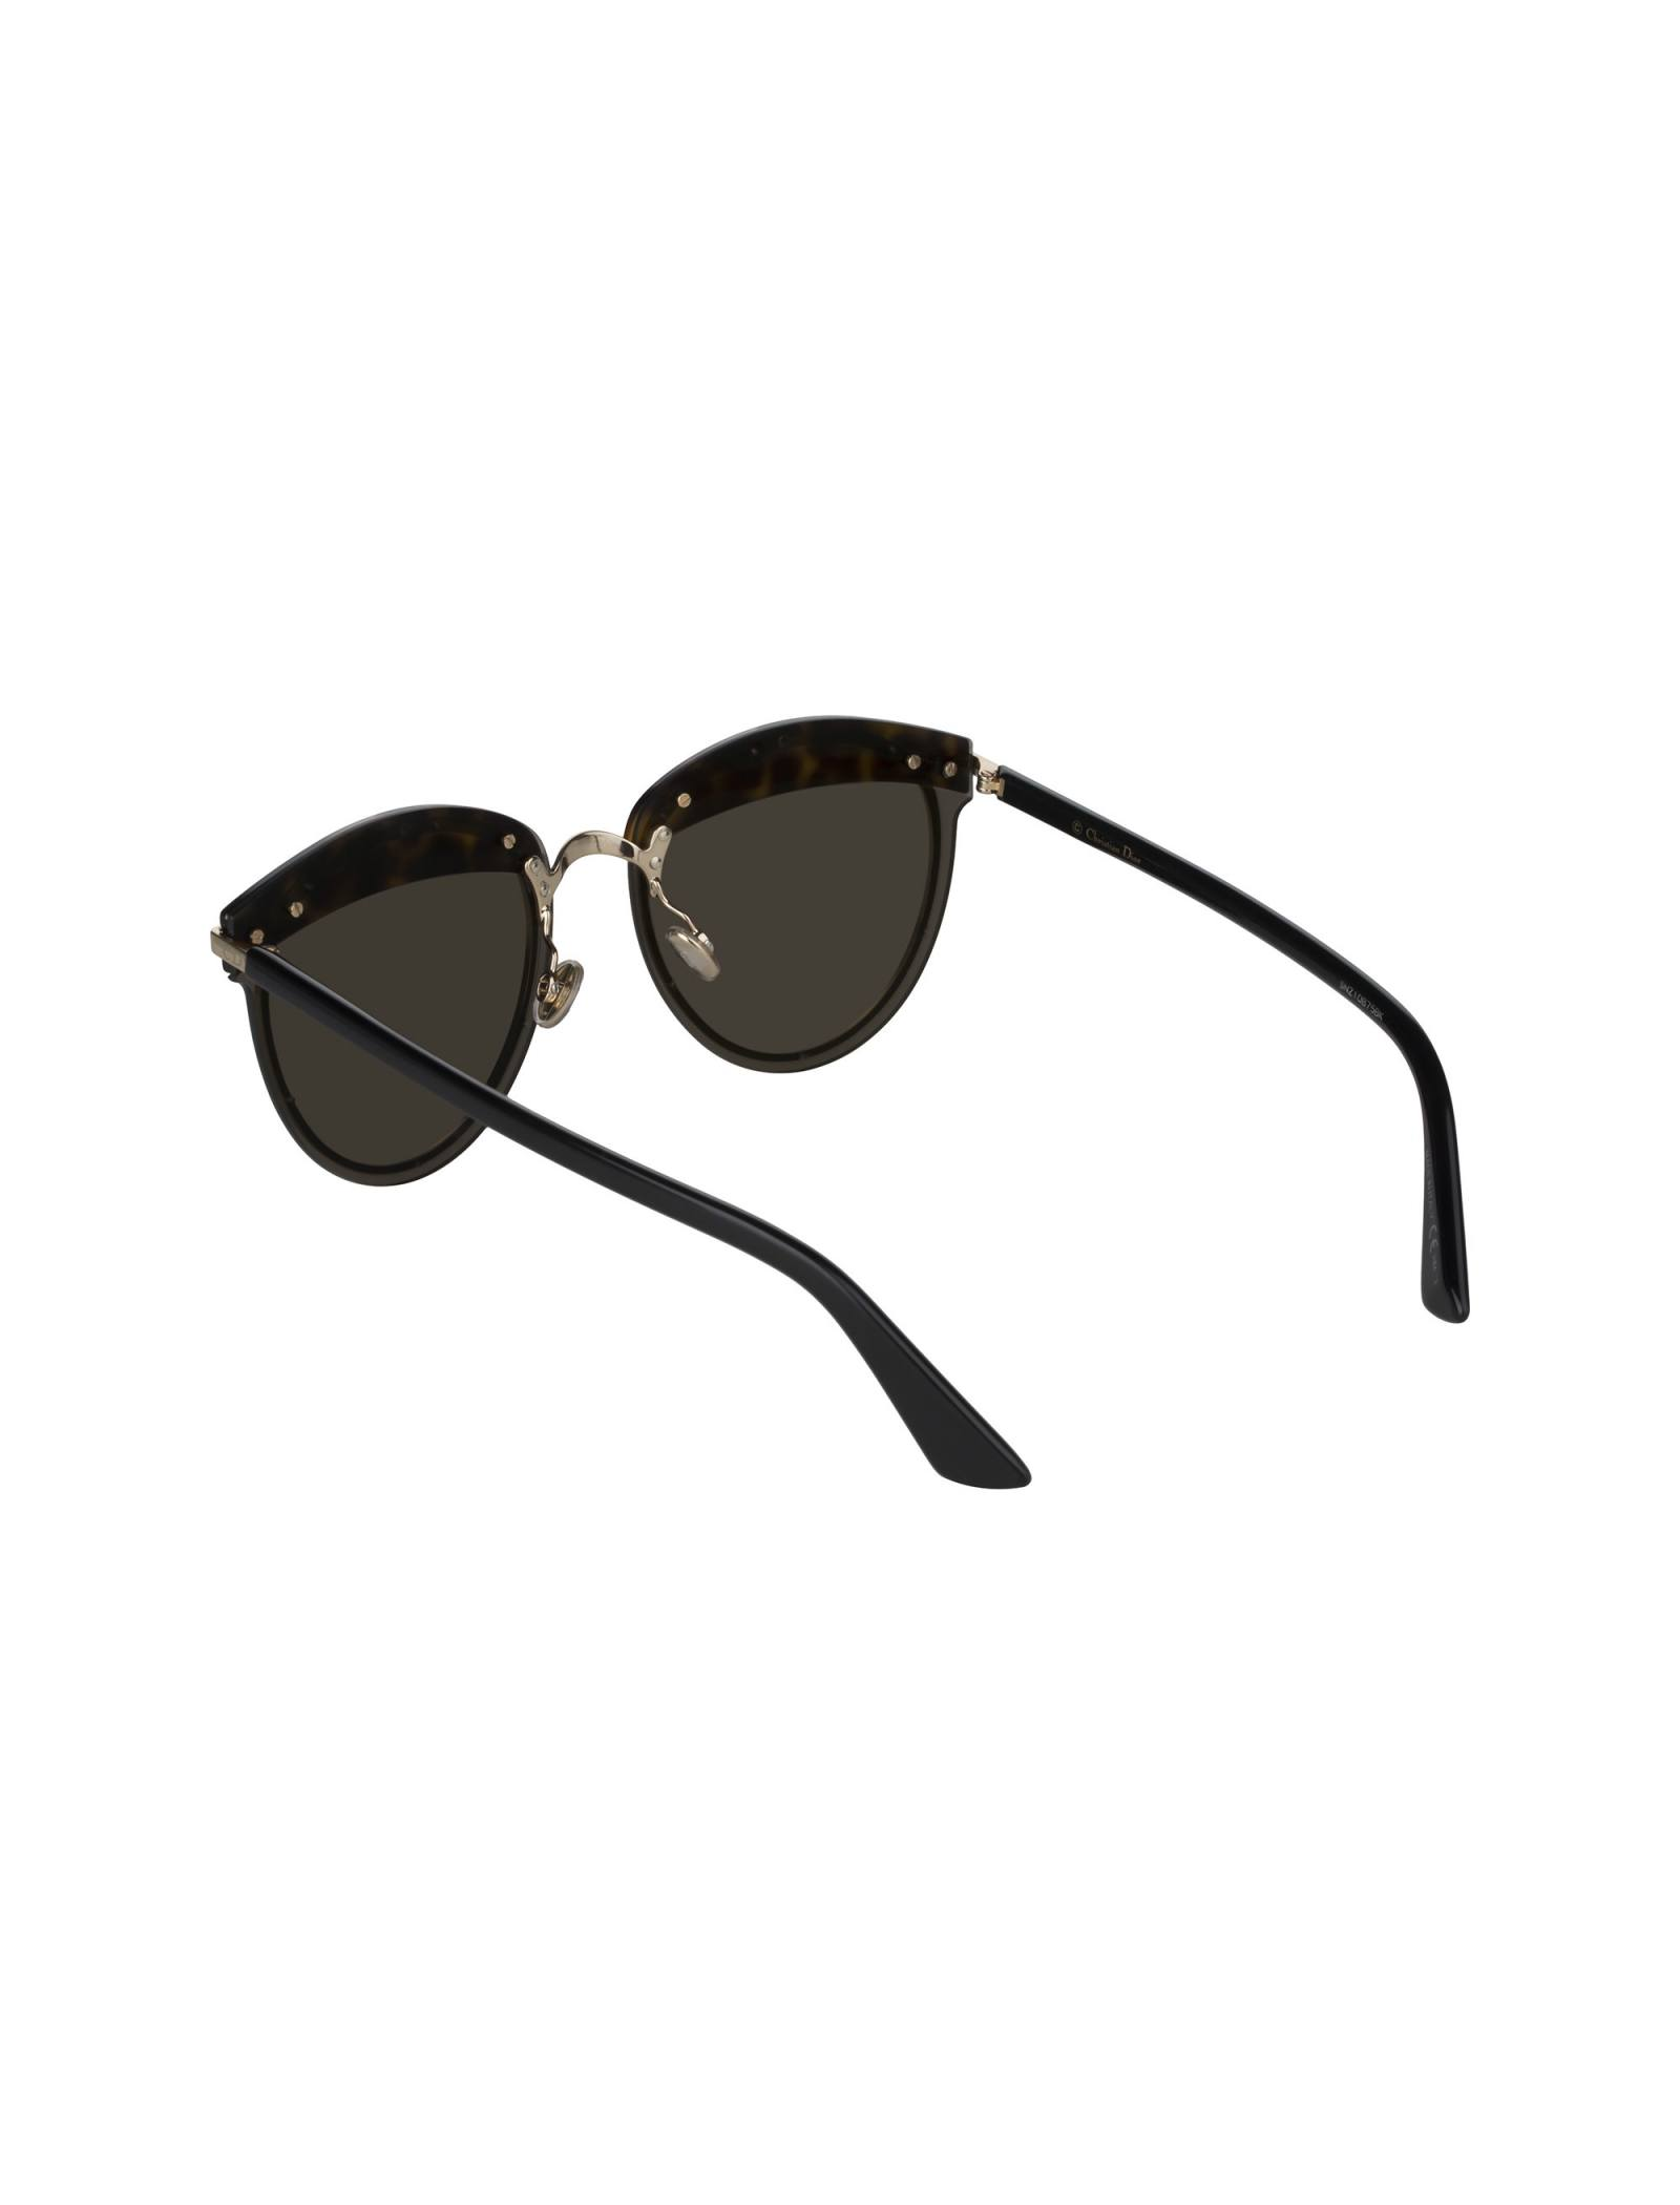 عینک آفتابی پنتوس زنانه - دیور - مشکي لاک پشتي - 4